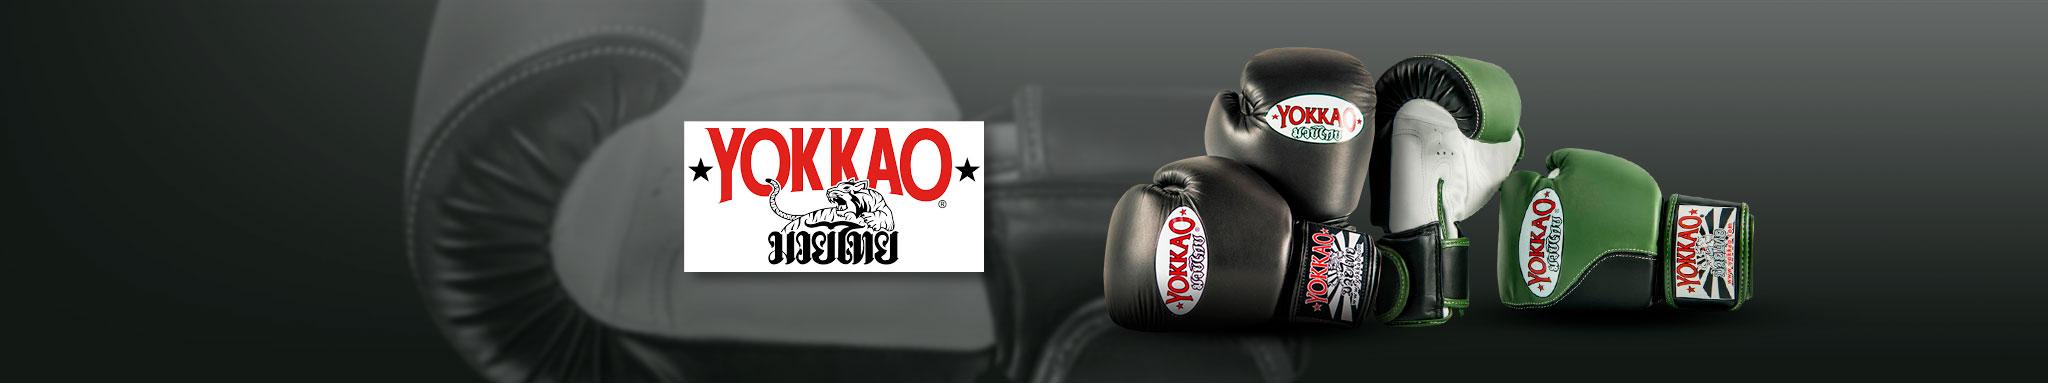 YOKKAO : vêtements, équipements & accessoires de la marque YOKKAO | Dragon Bleu